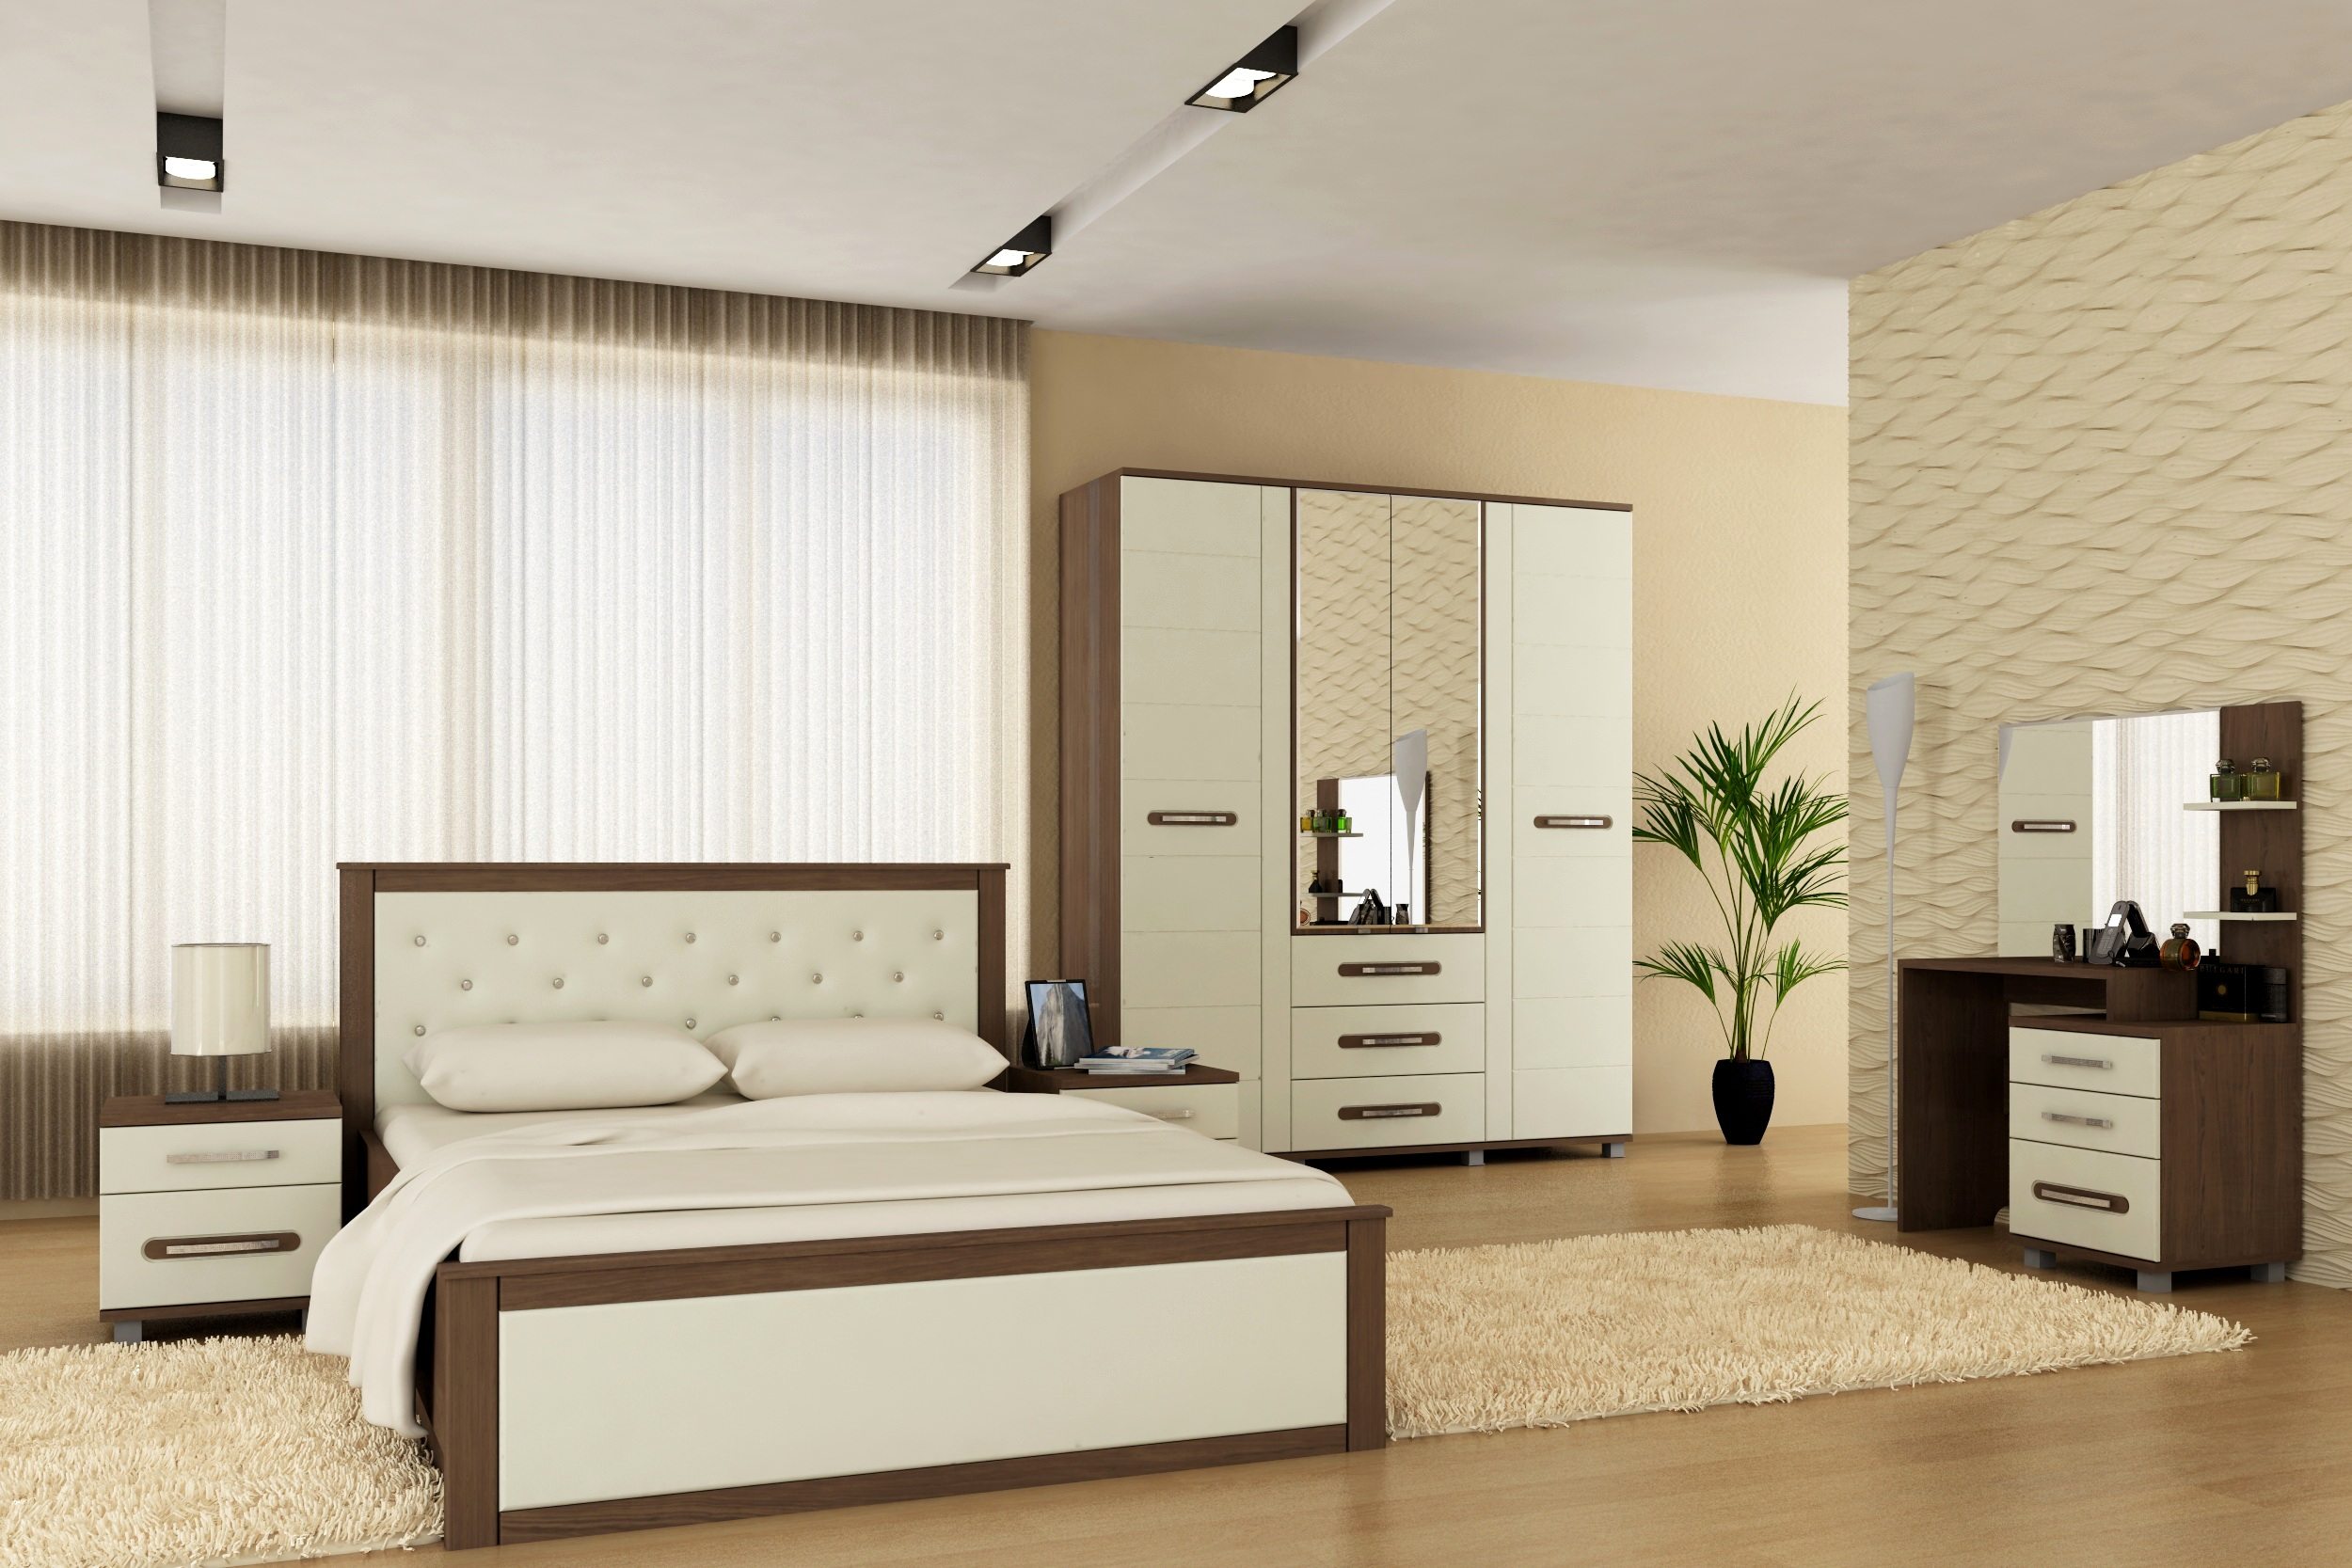 мебель оптом нефтекамск